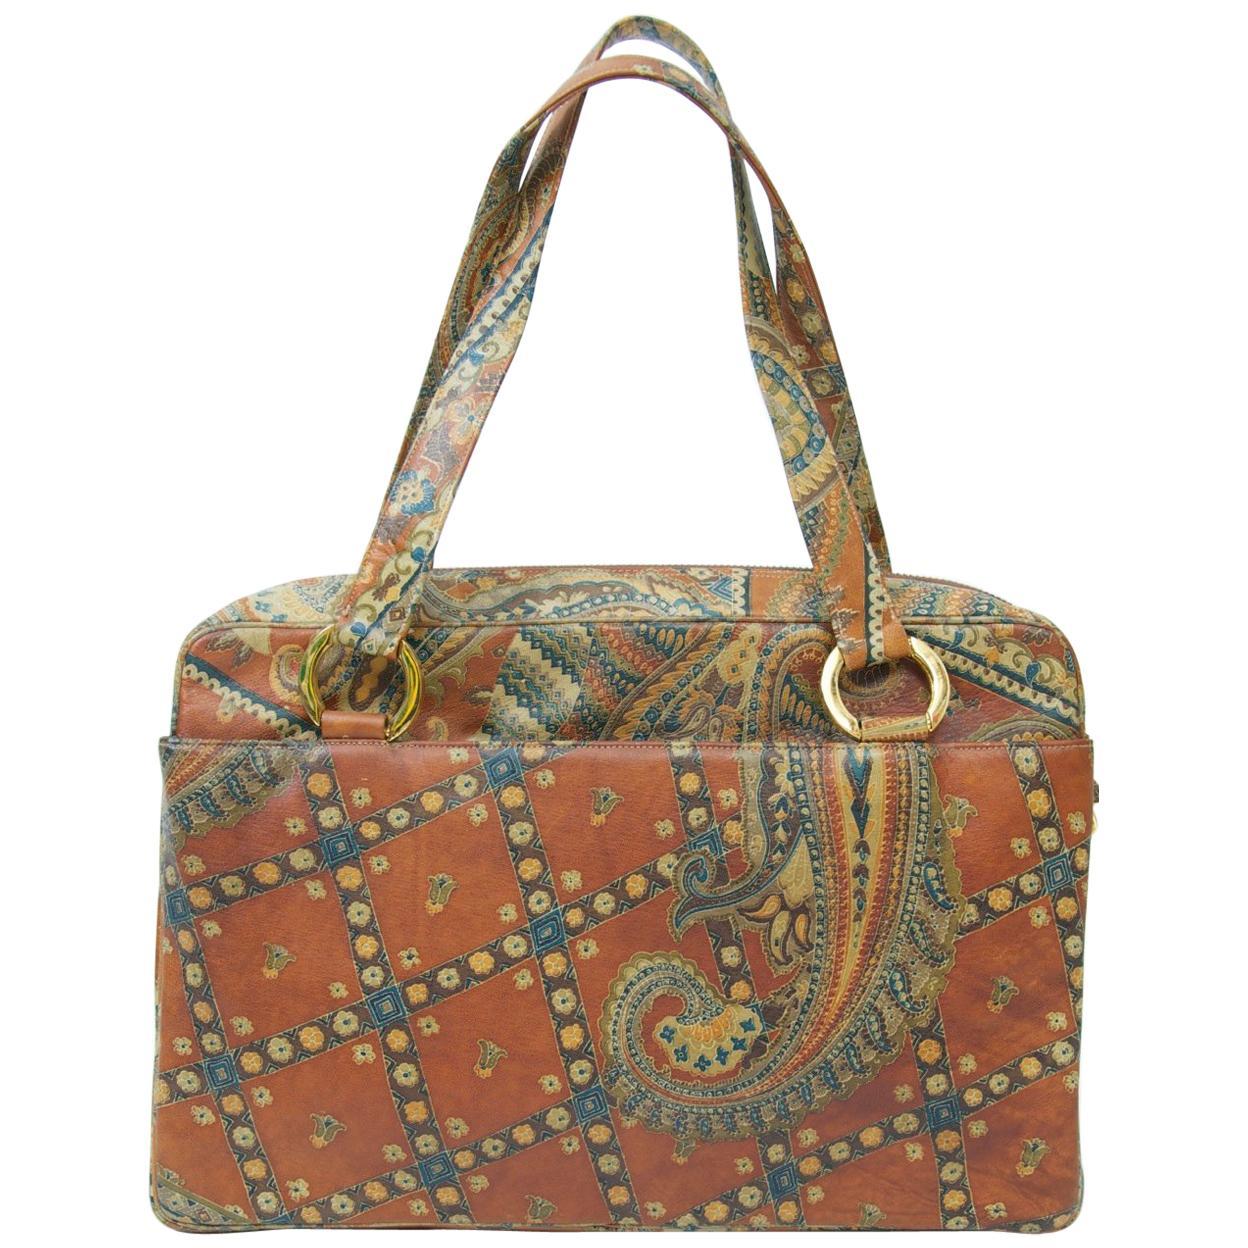 MM Odyssey Paisley Handbag and Wallet